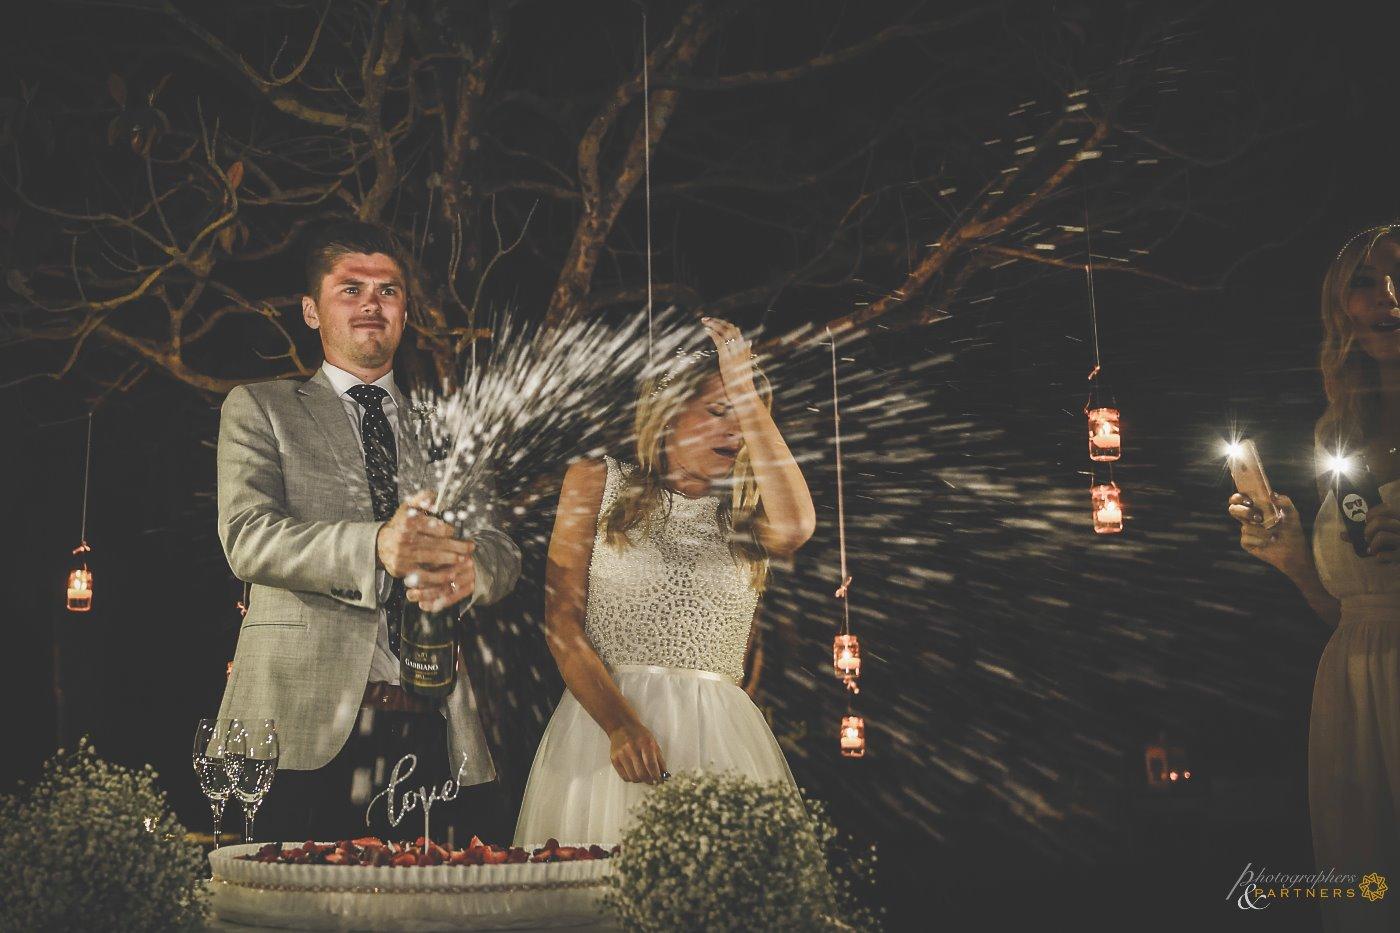 photo_weddings_castello_gabbiano_21.jpg